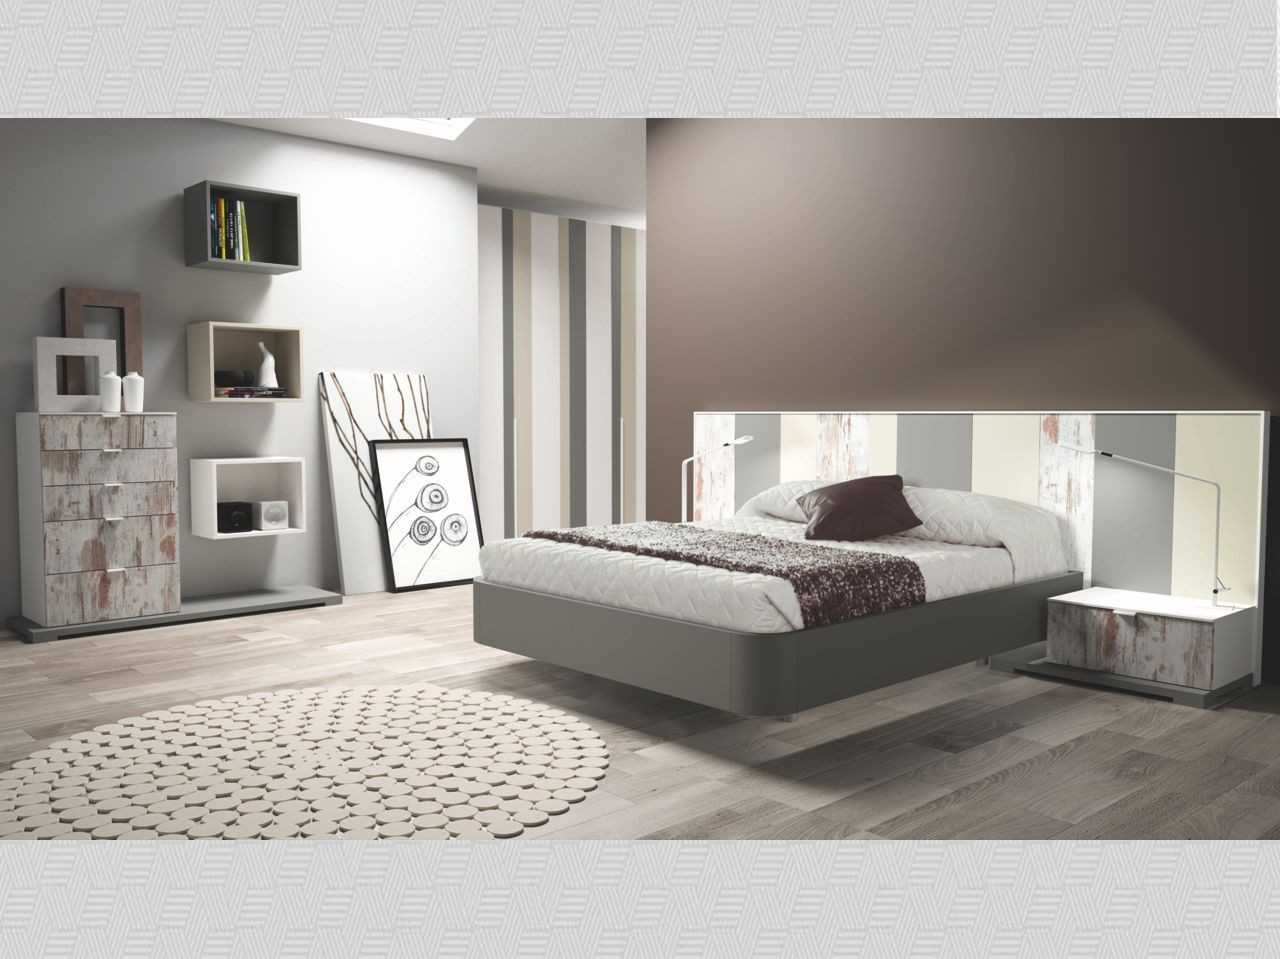 Dormitorio matrimonio antik antracita arena y blanco